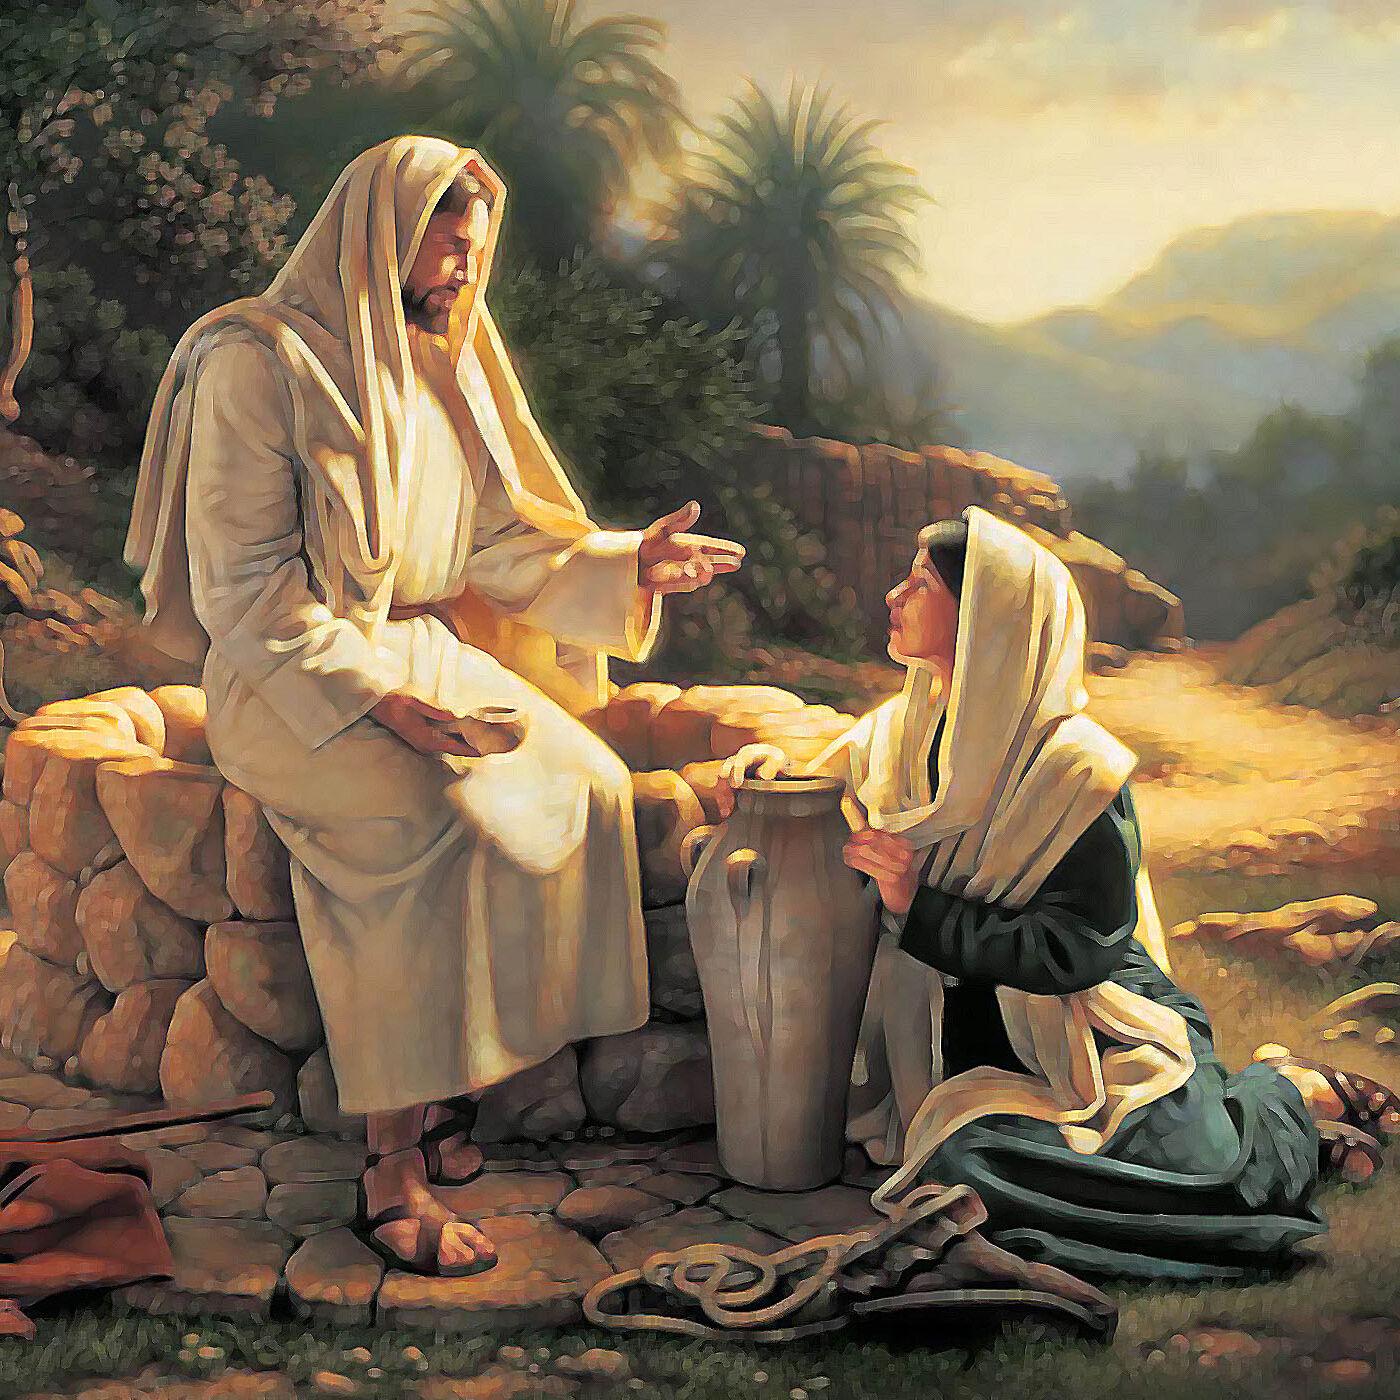 riflessioni sul Vangelo di Giovedì 14 Gennaio 2021 (Mc 1, 40-45) - Apostola Simona